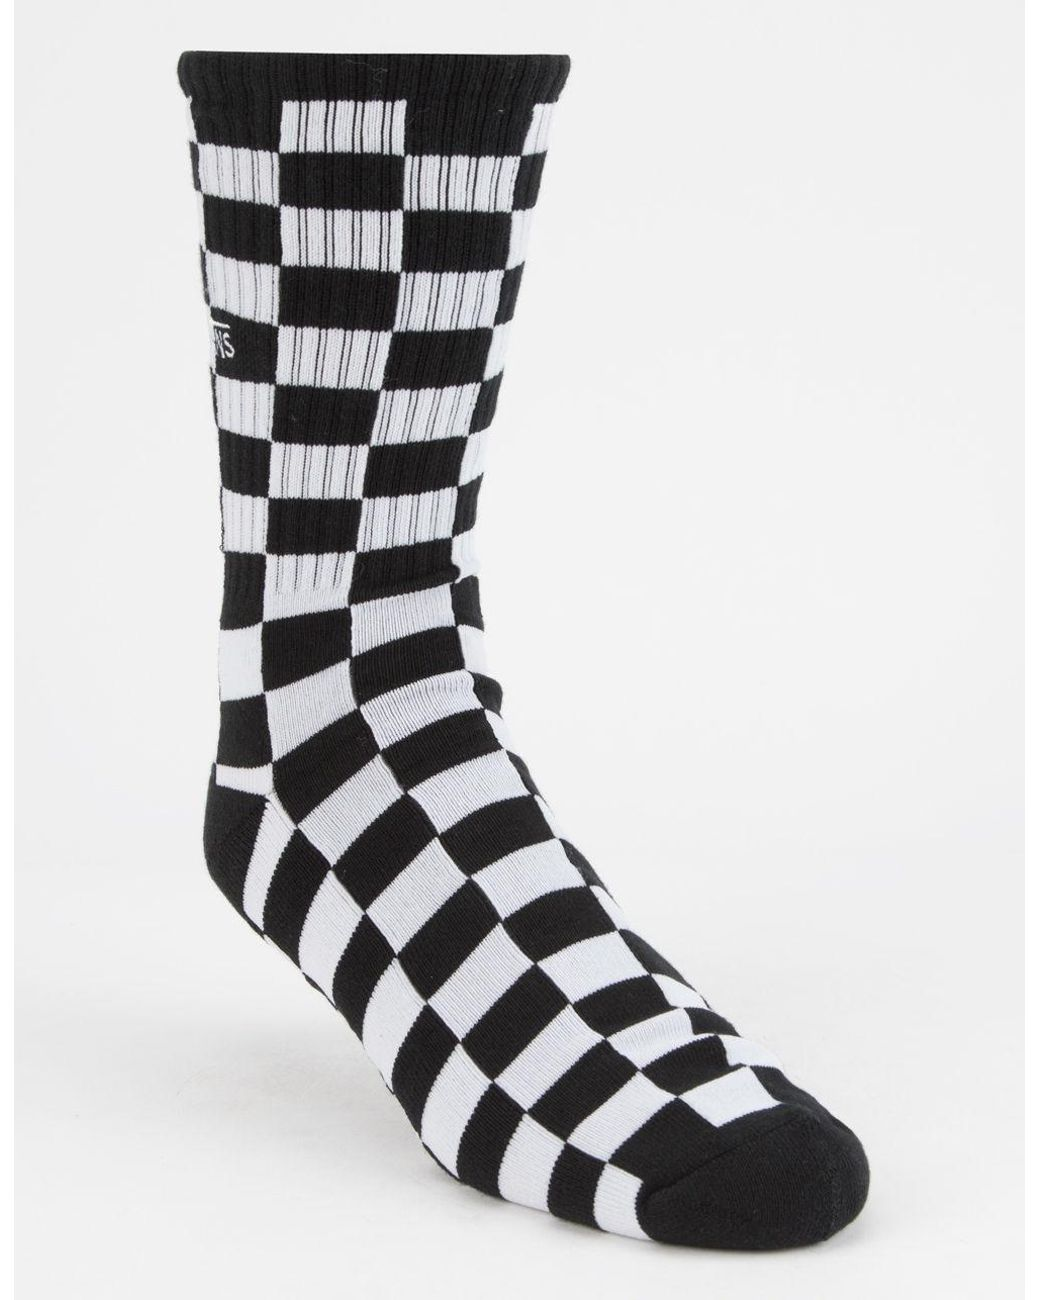 b3b3fcfb7d3c Lyst - Vans Checkerboard 1 Pack Socks In Black Vn0a3h3ohu01 in Black ...